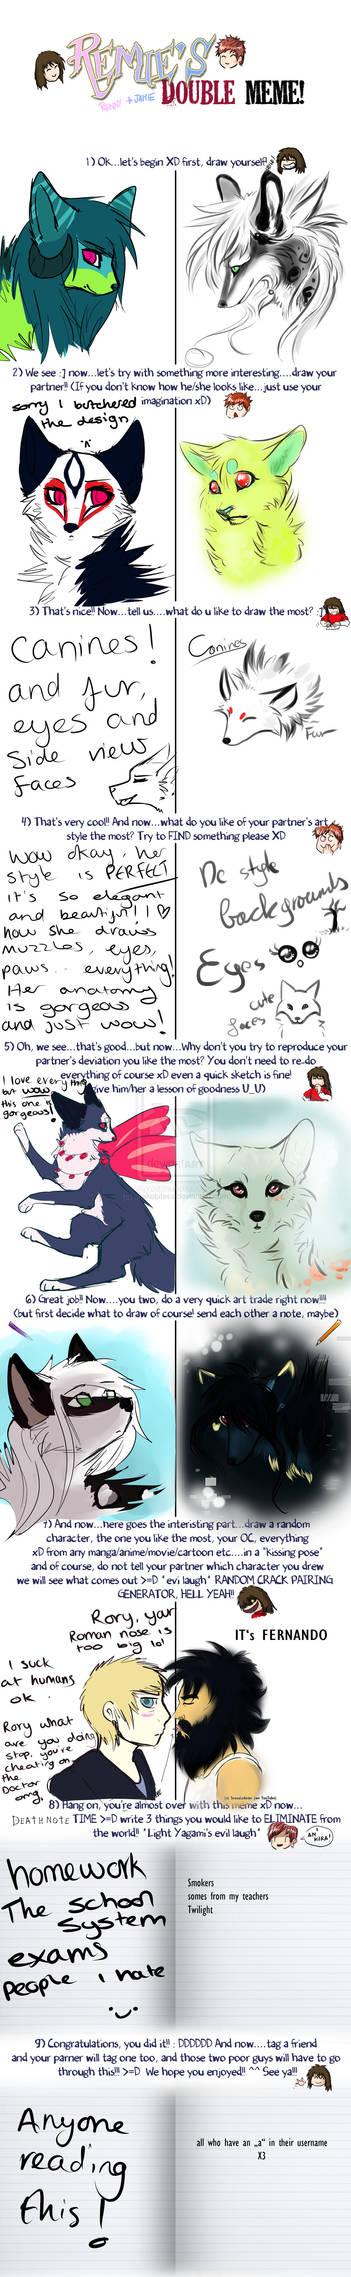 Memes by Snow-Body on DeviantArt